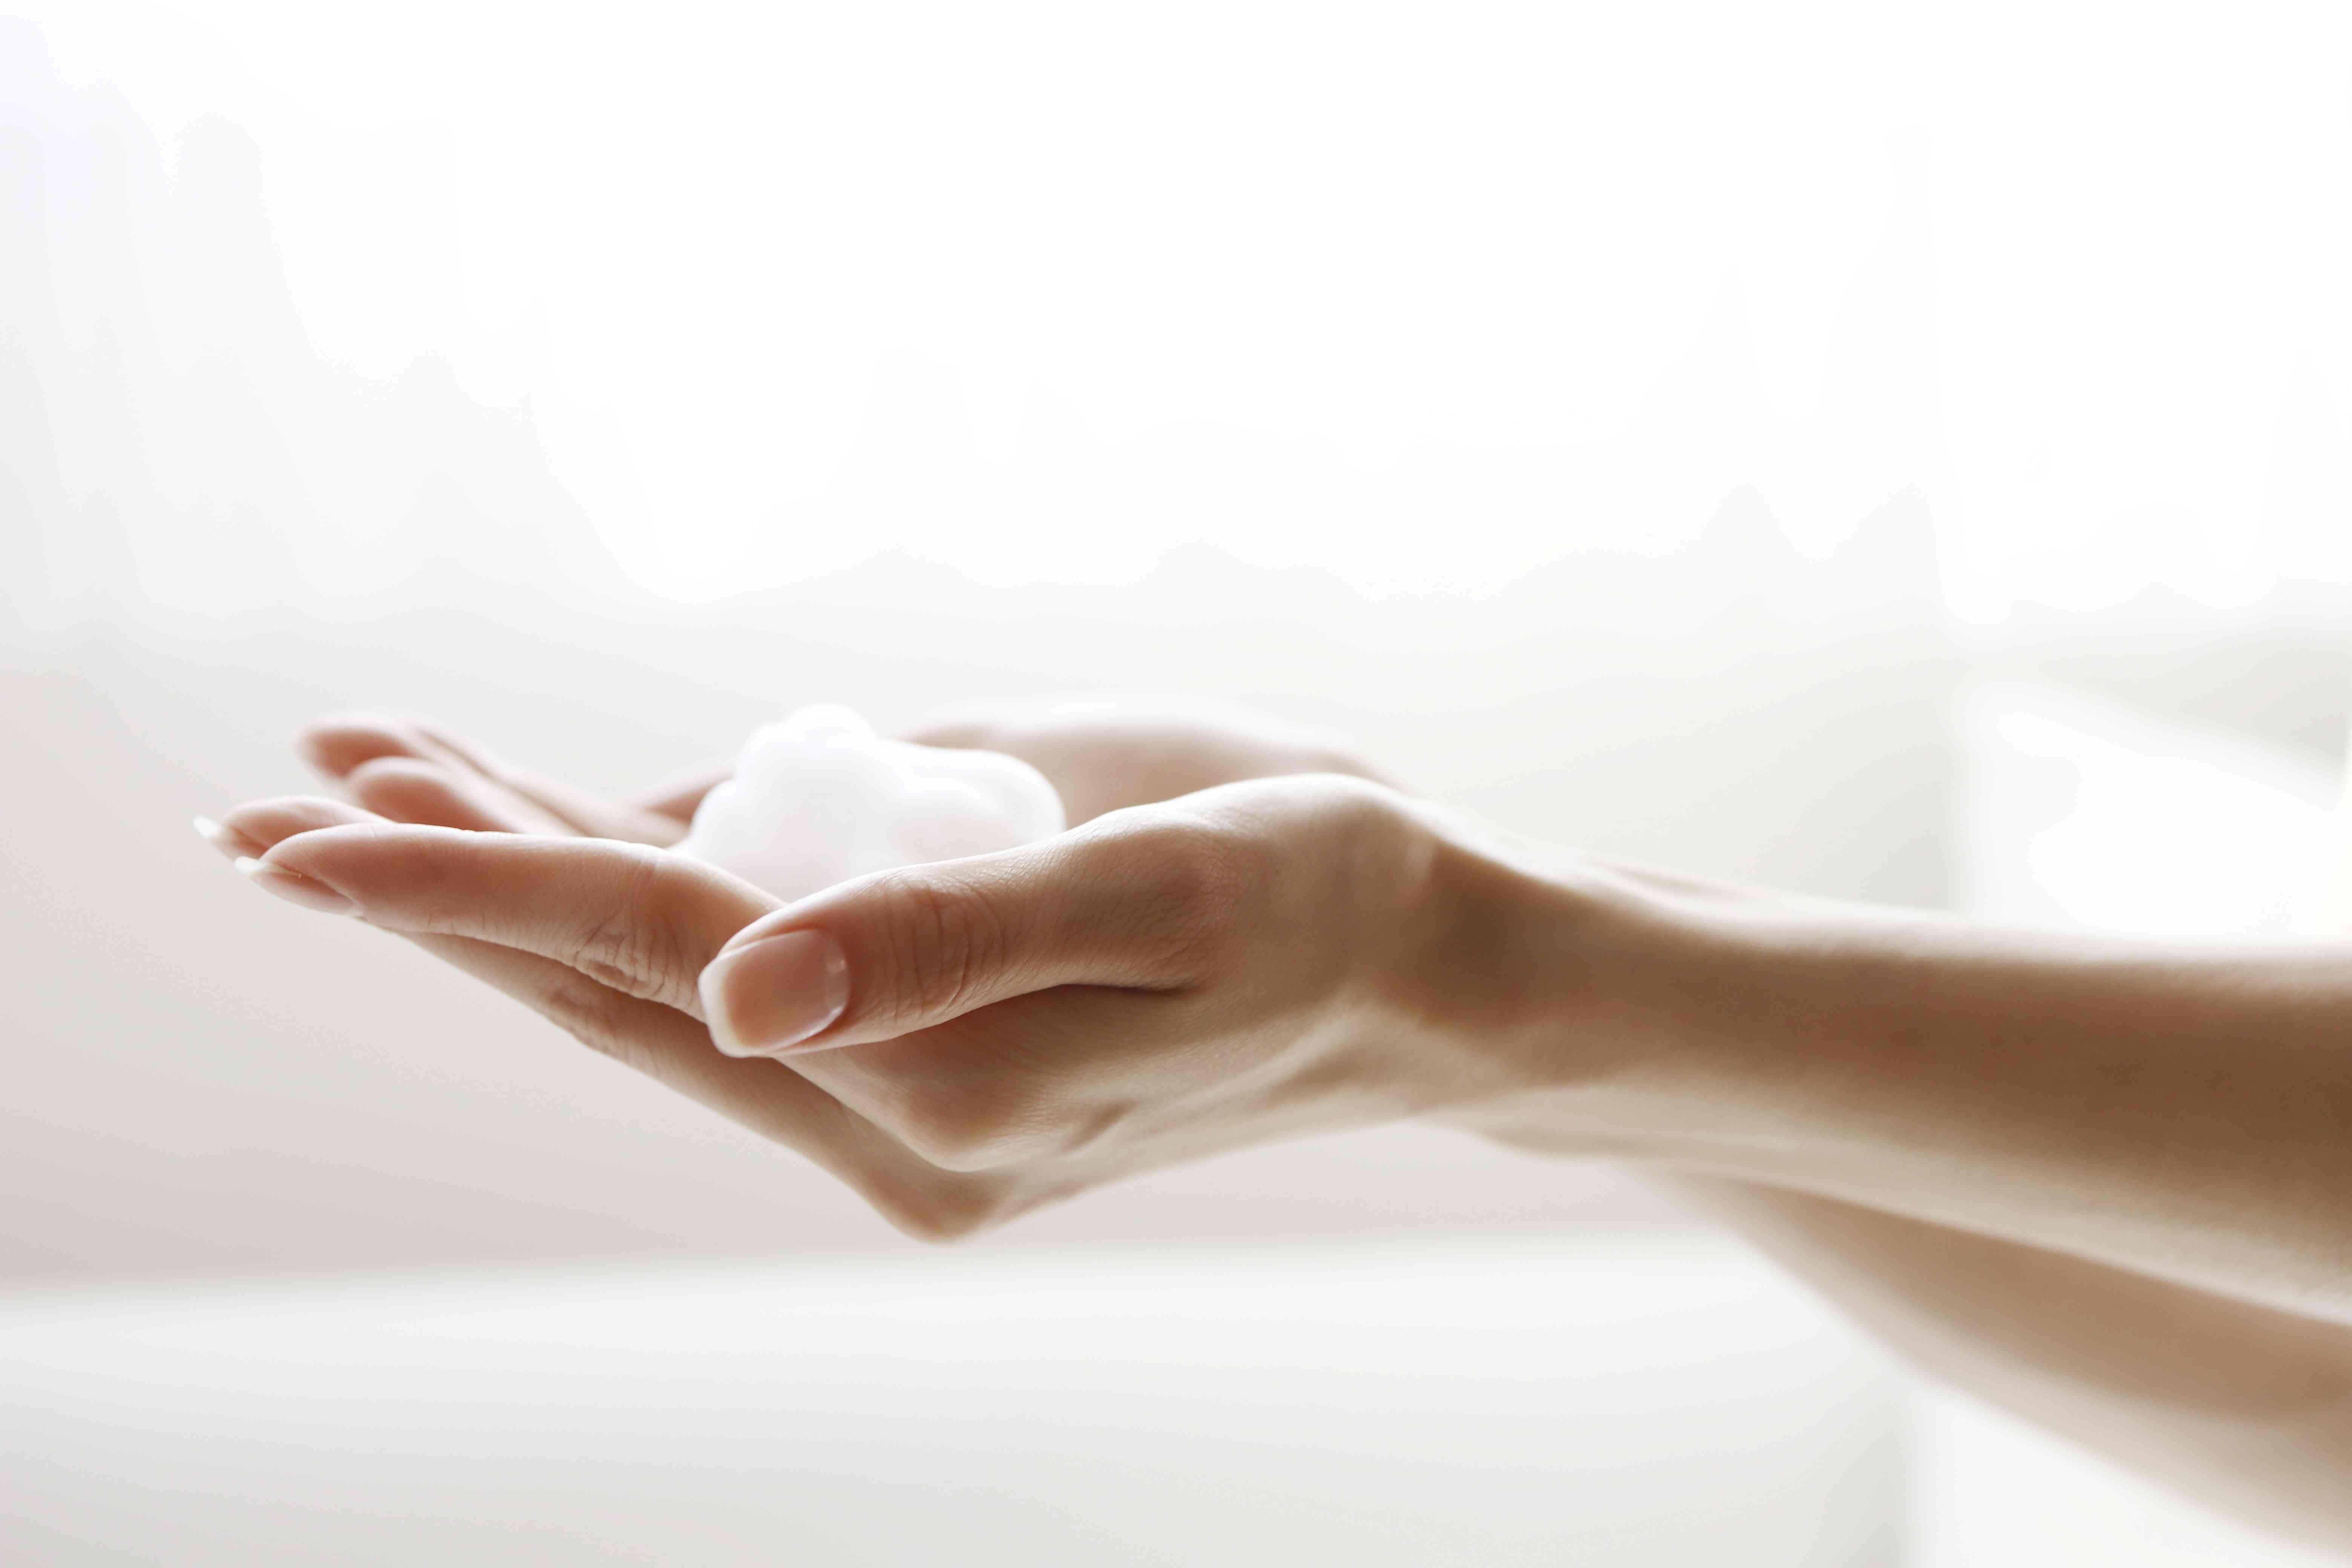 Liquid body soap foam on hands